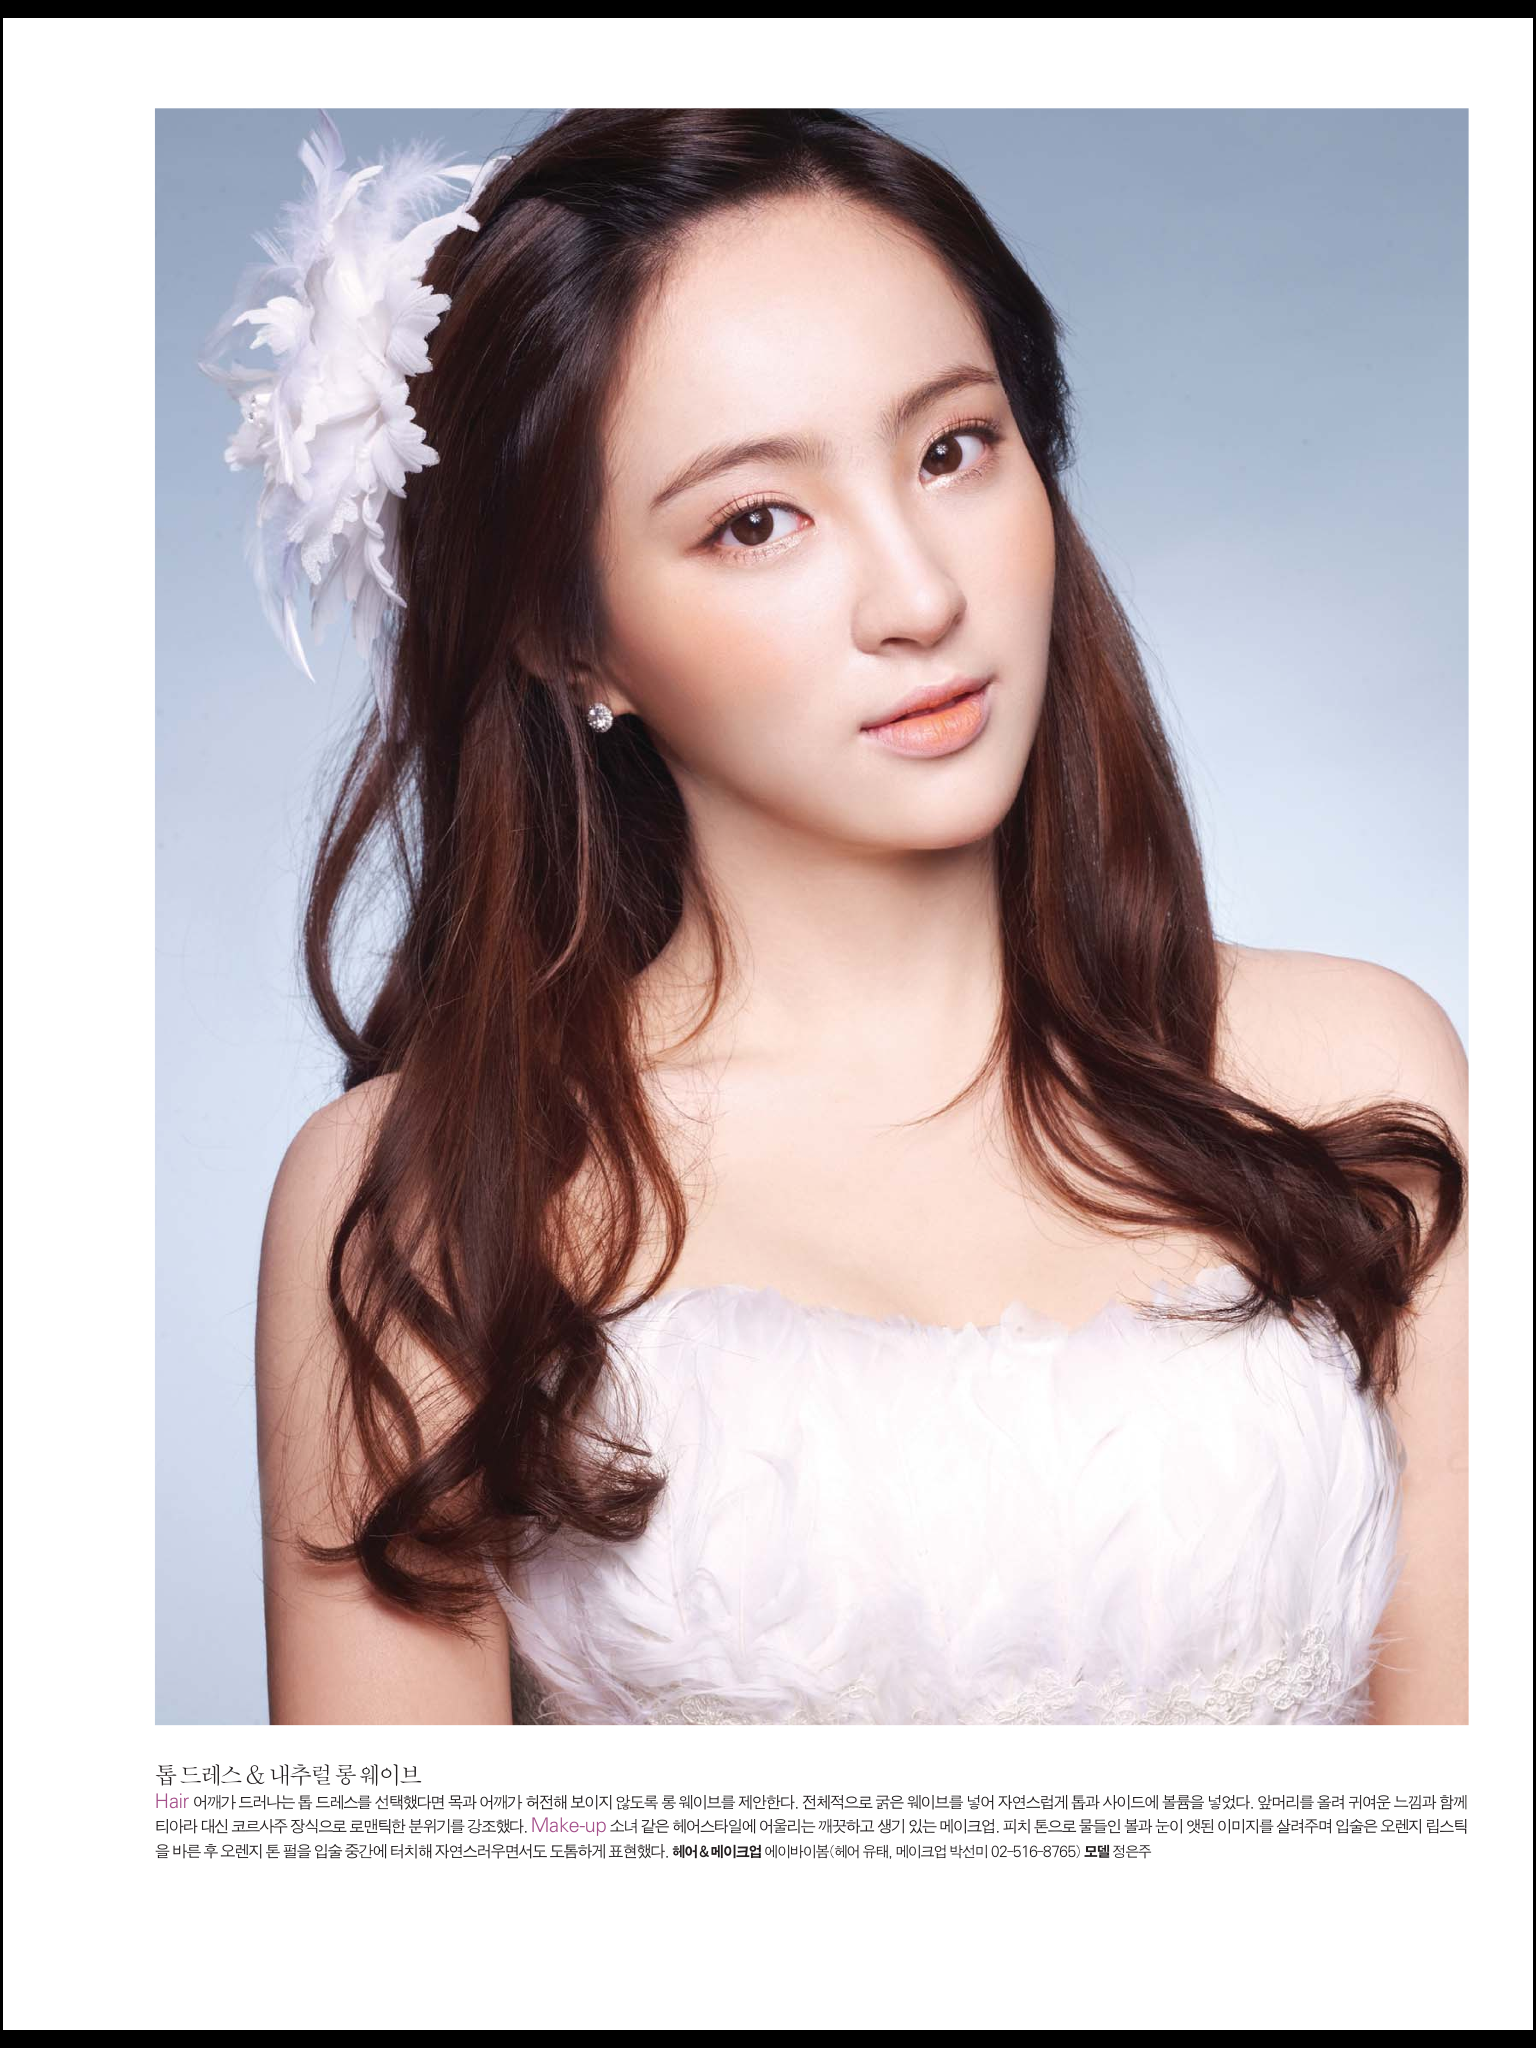 natural long hair styling and peach color cheek and orange lip make up korean concept wedding photography idowedding www ido wedding com